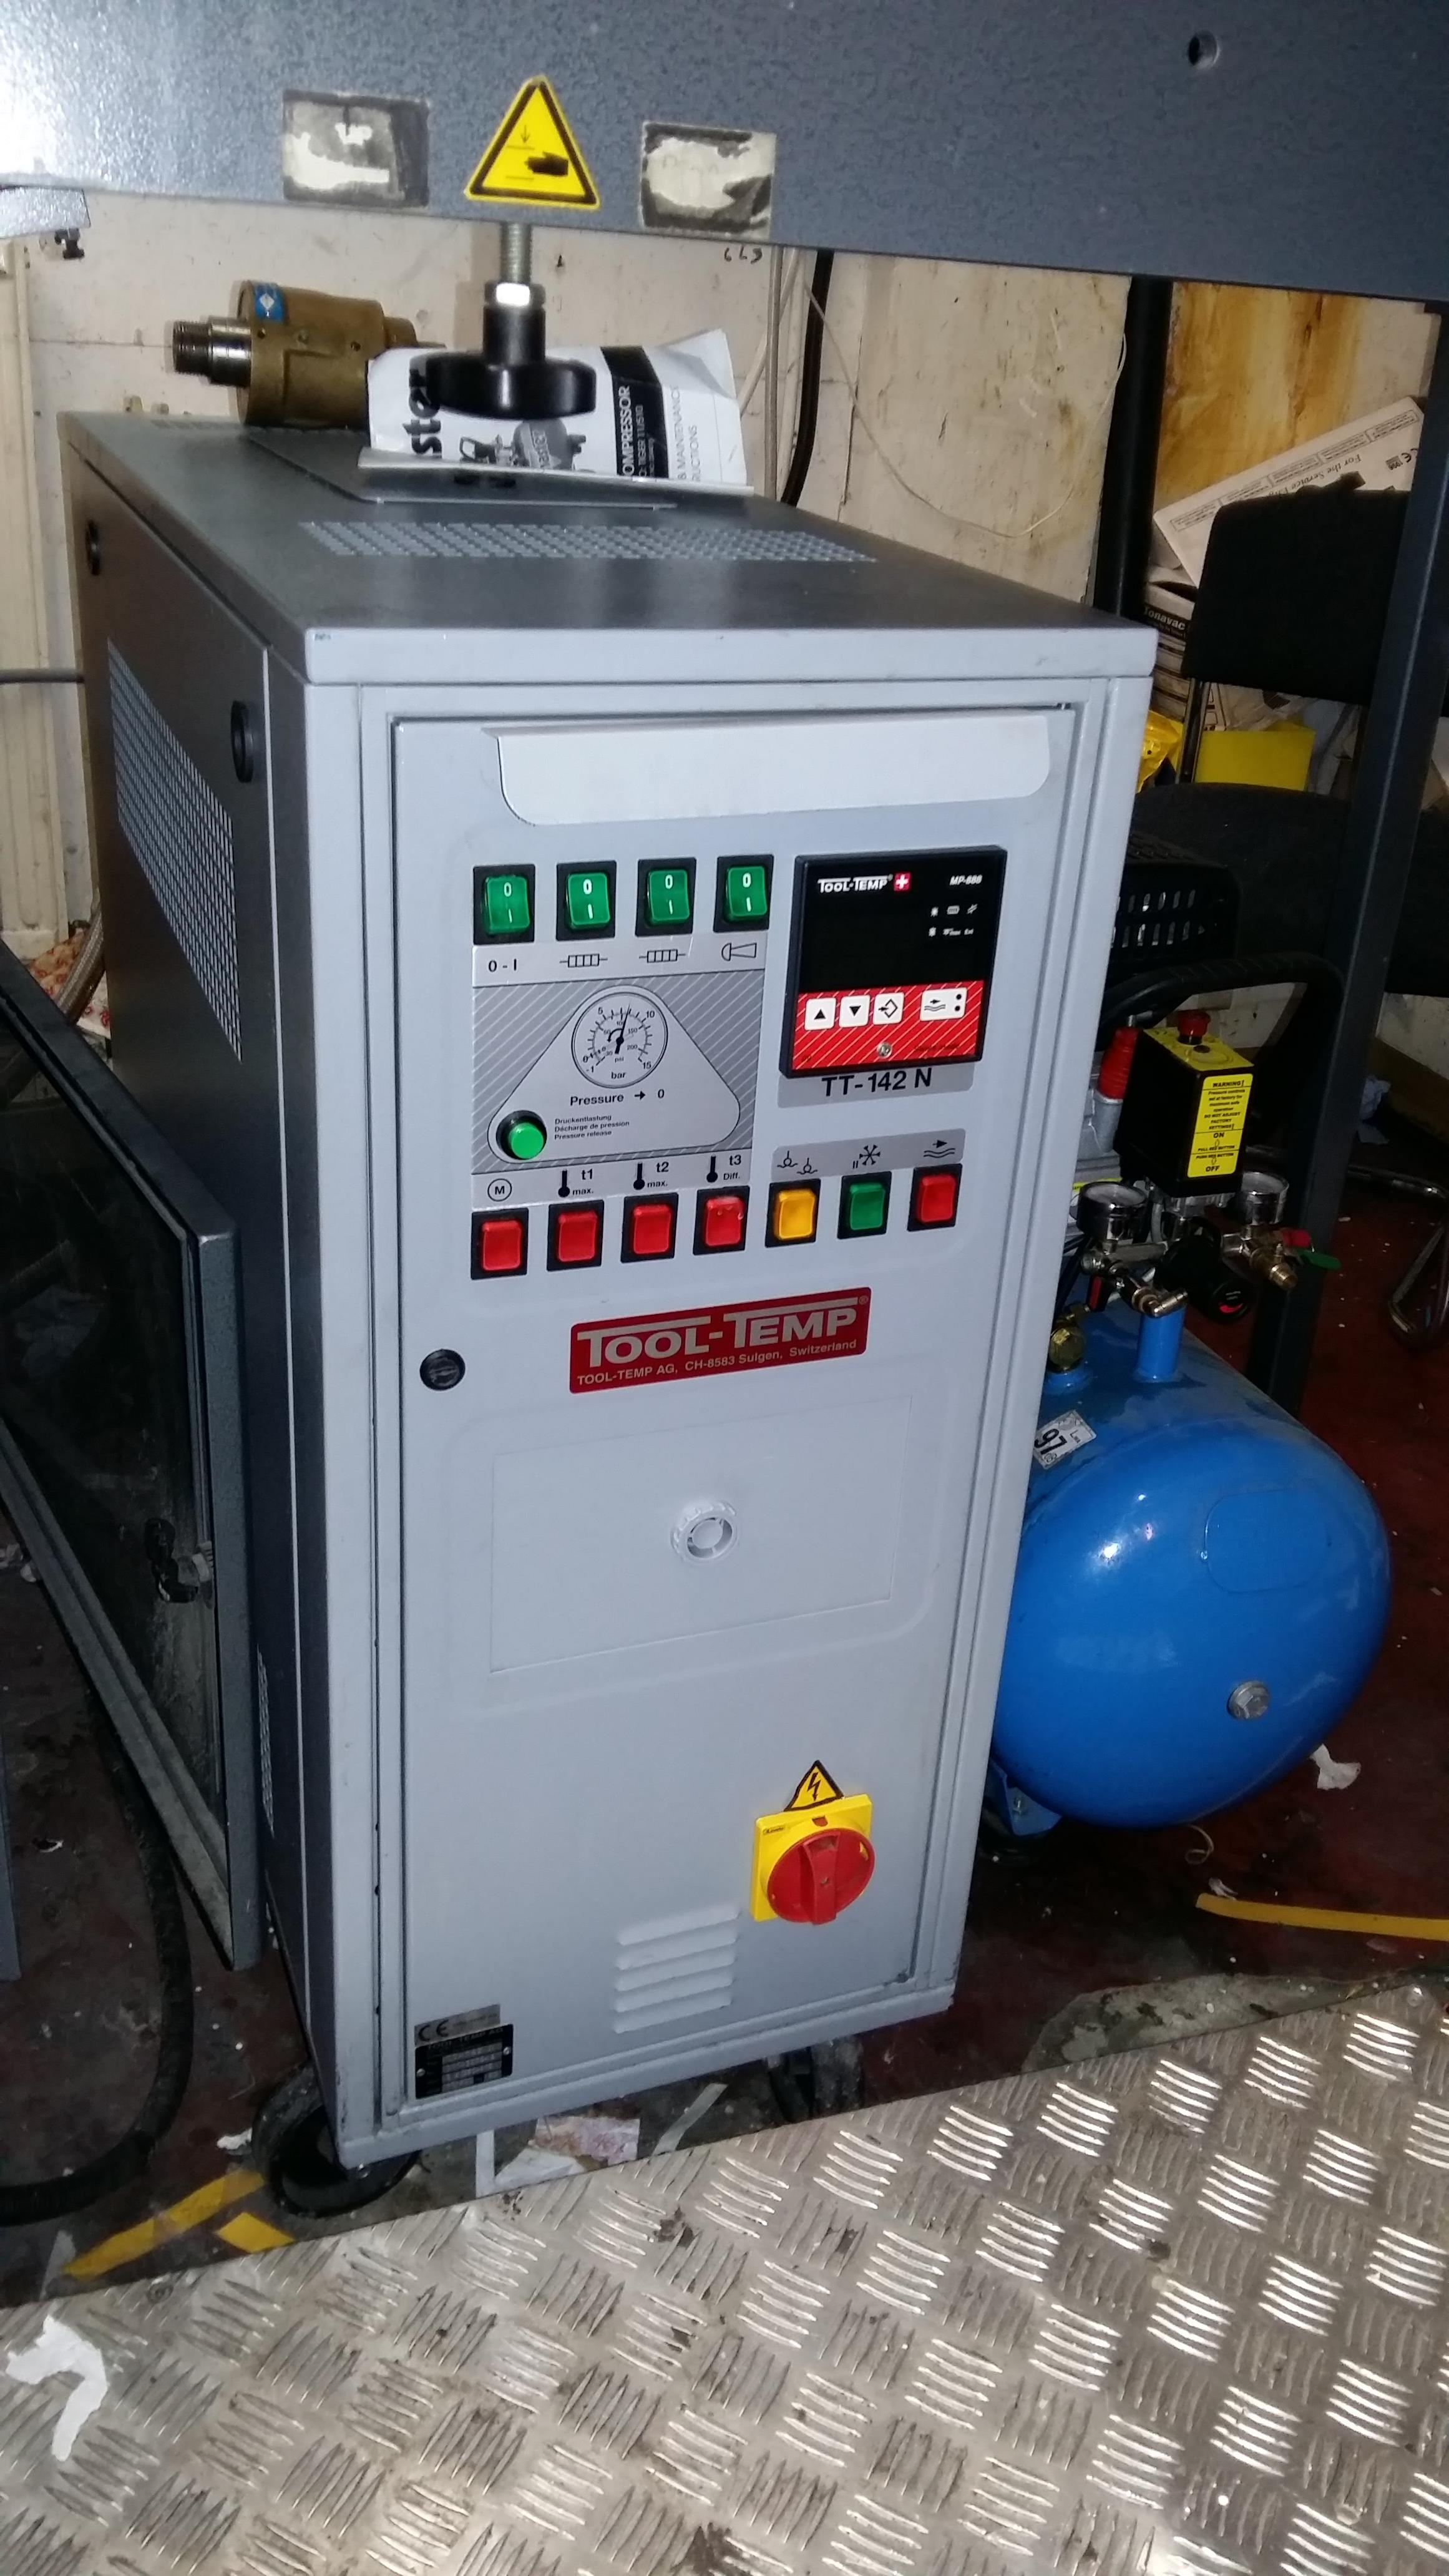 Lot 002 - Autobond Mini TP52 laminator